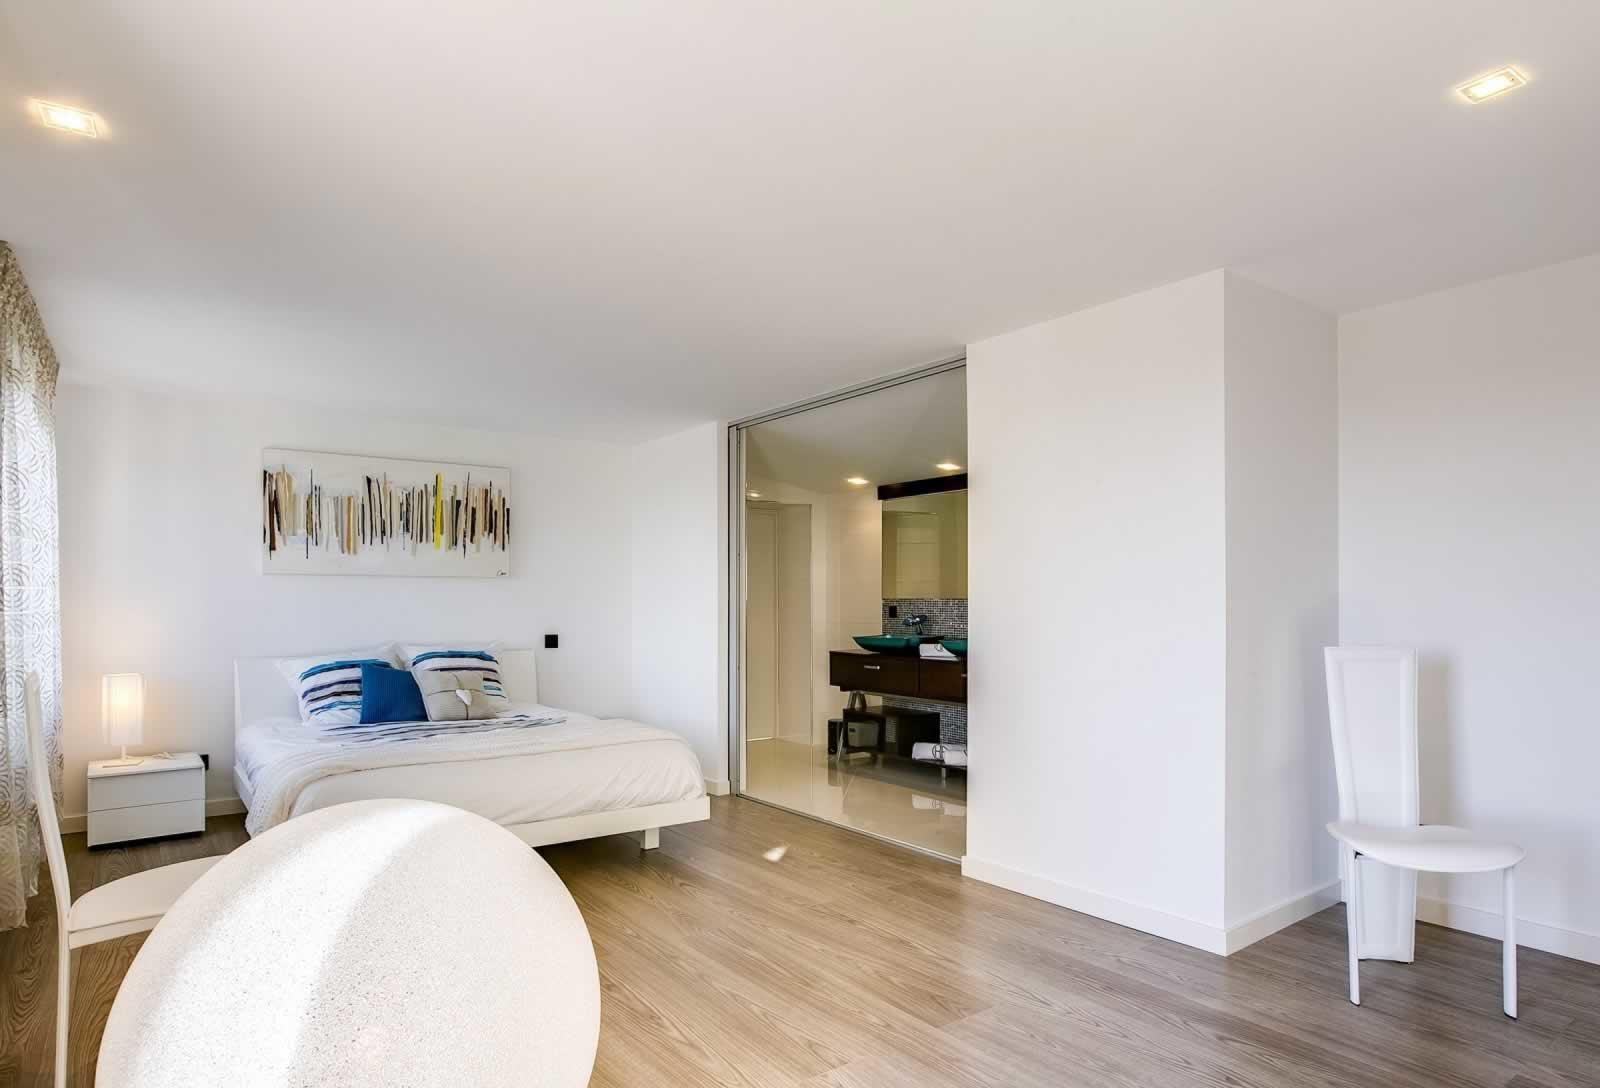 Best Medium Room Space Heater